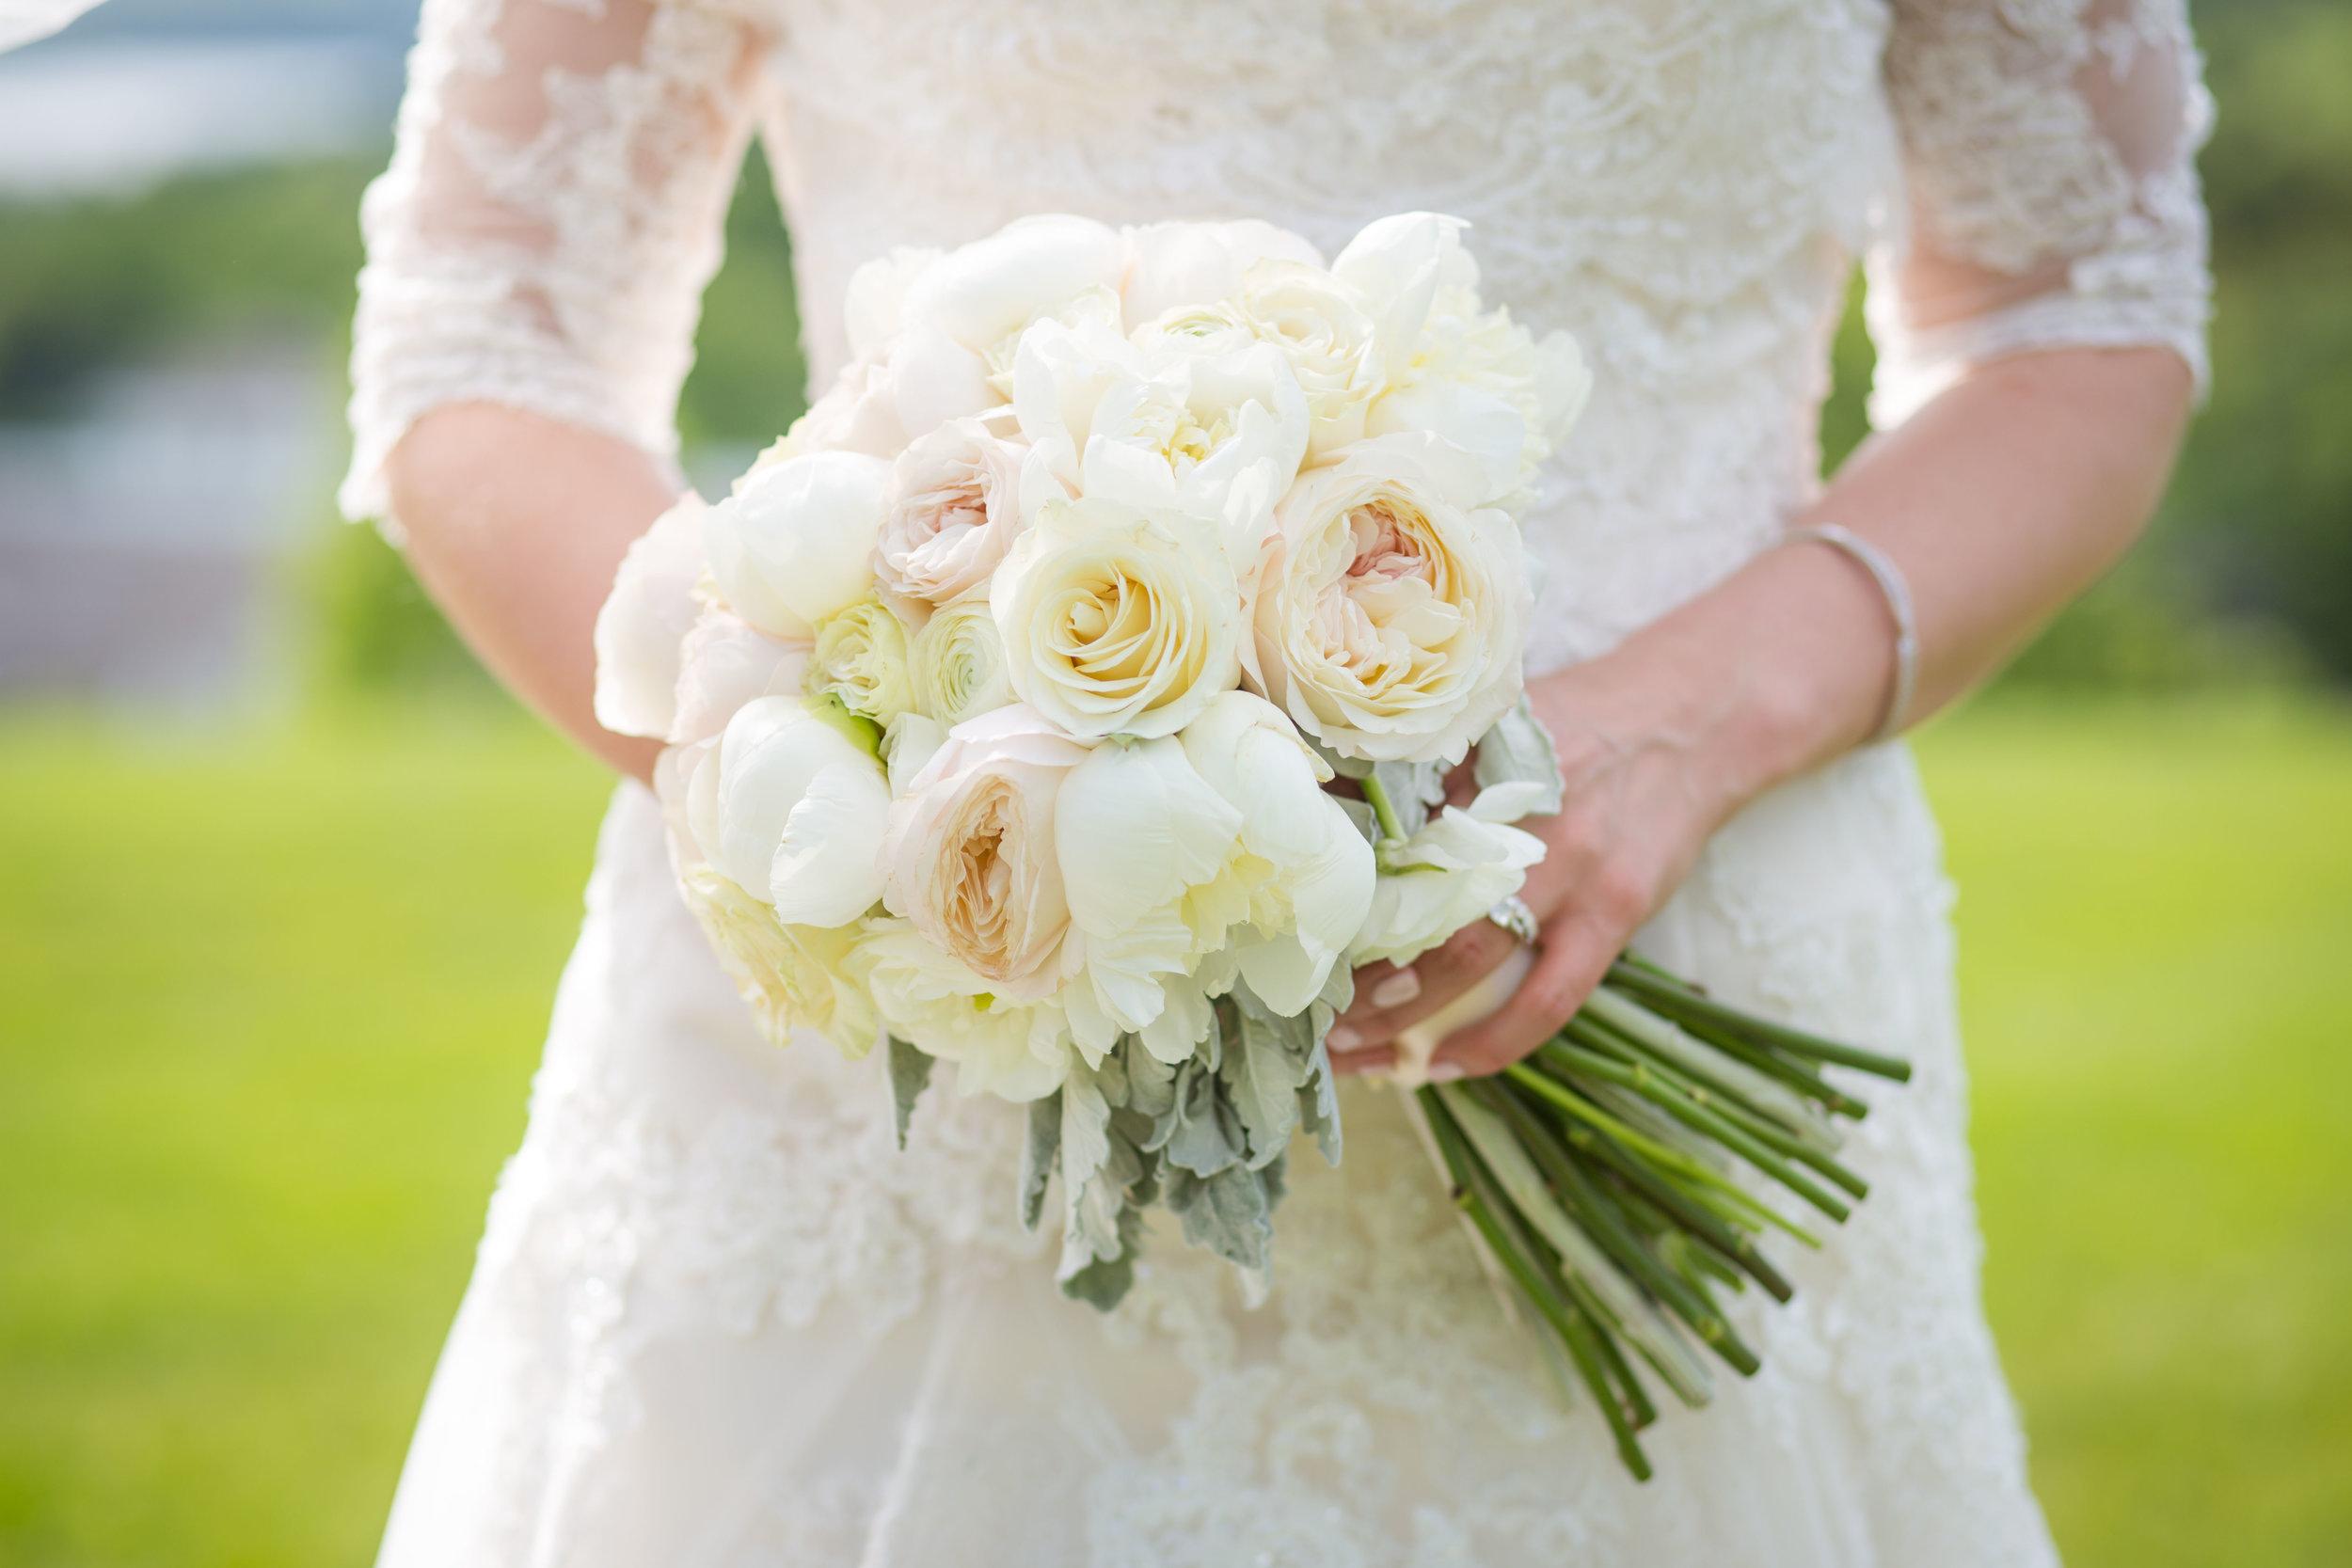 Bouquet Photography